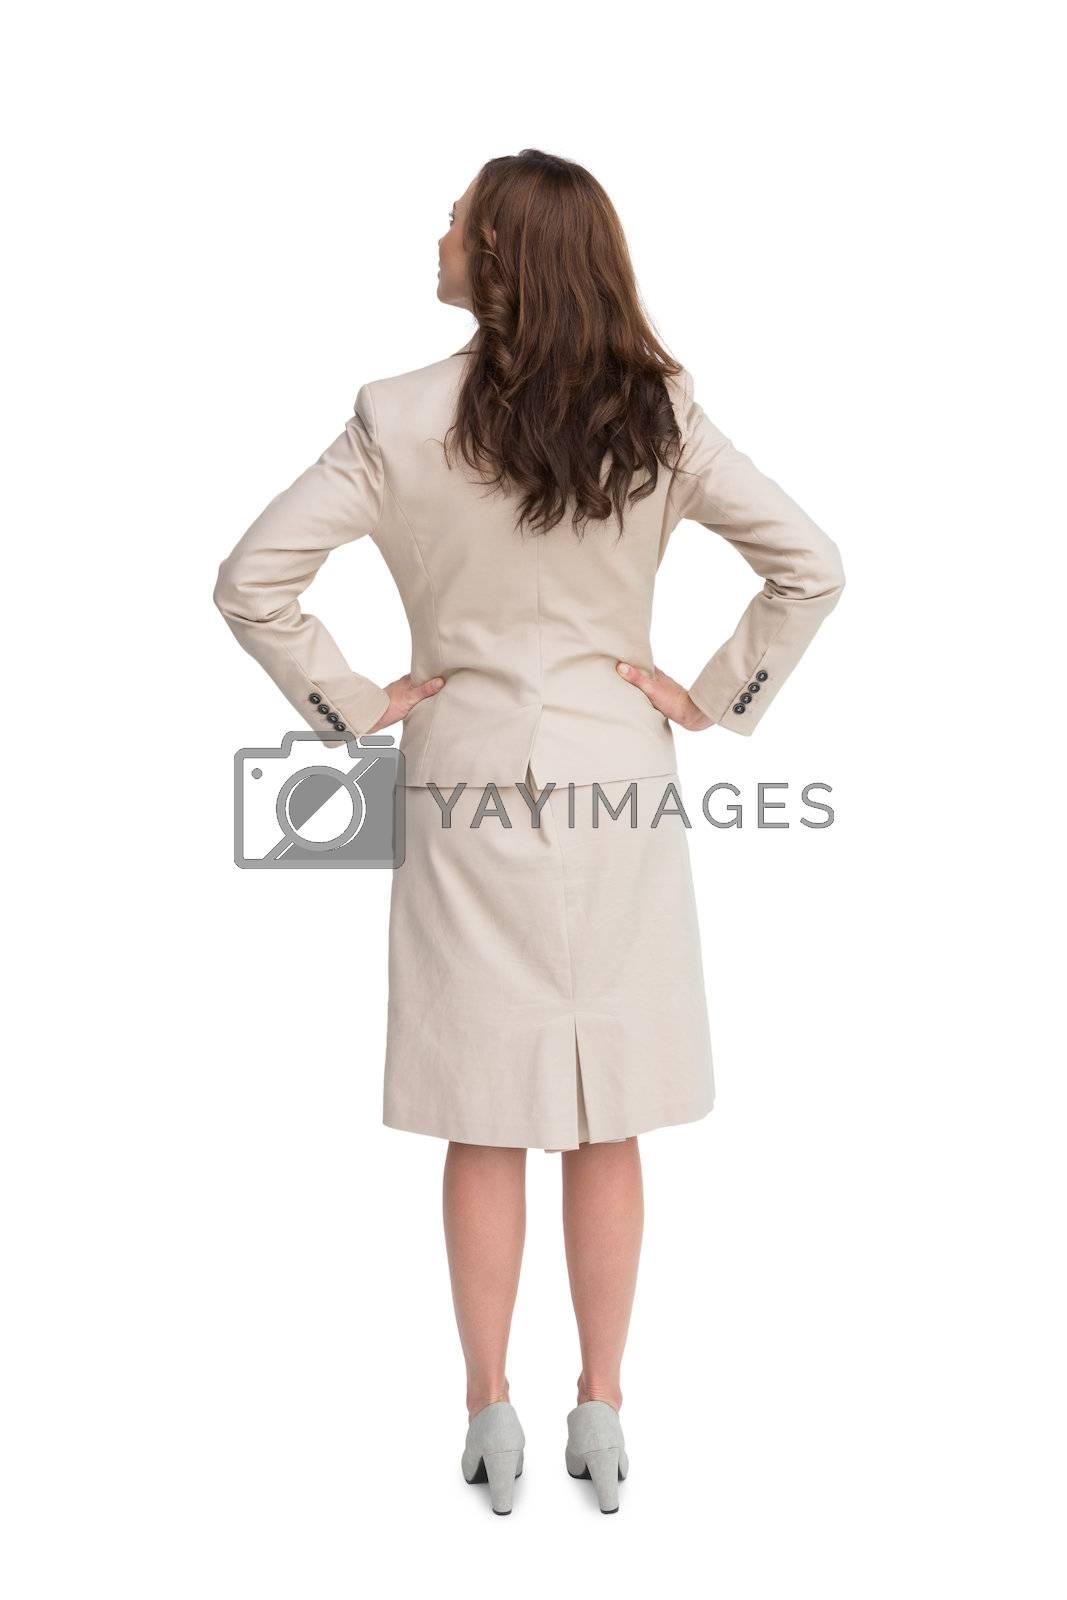 Rear view of businesswoman standing  by Wavebreakmedia